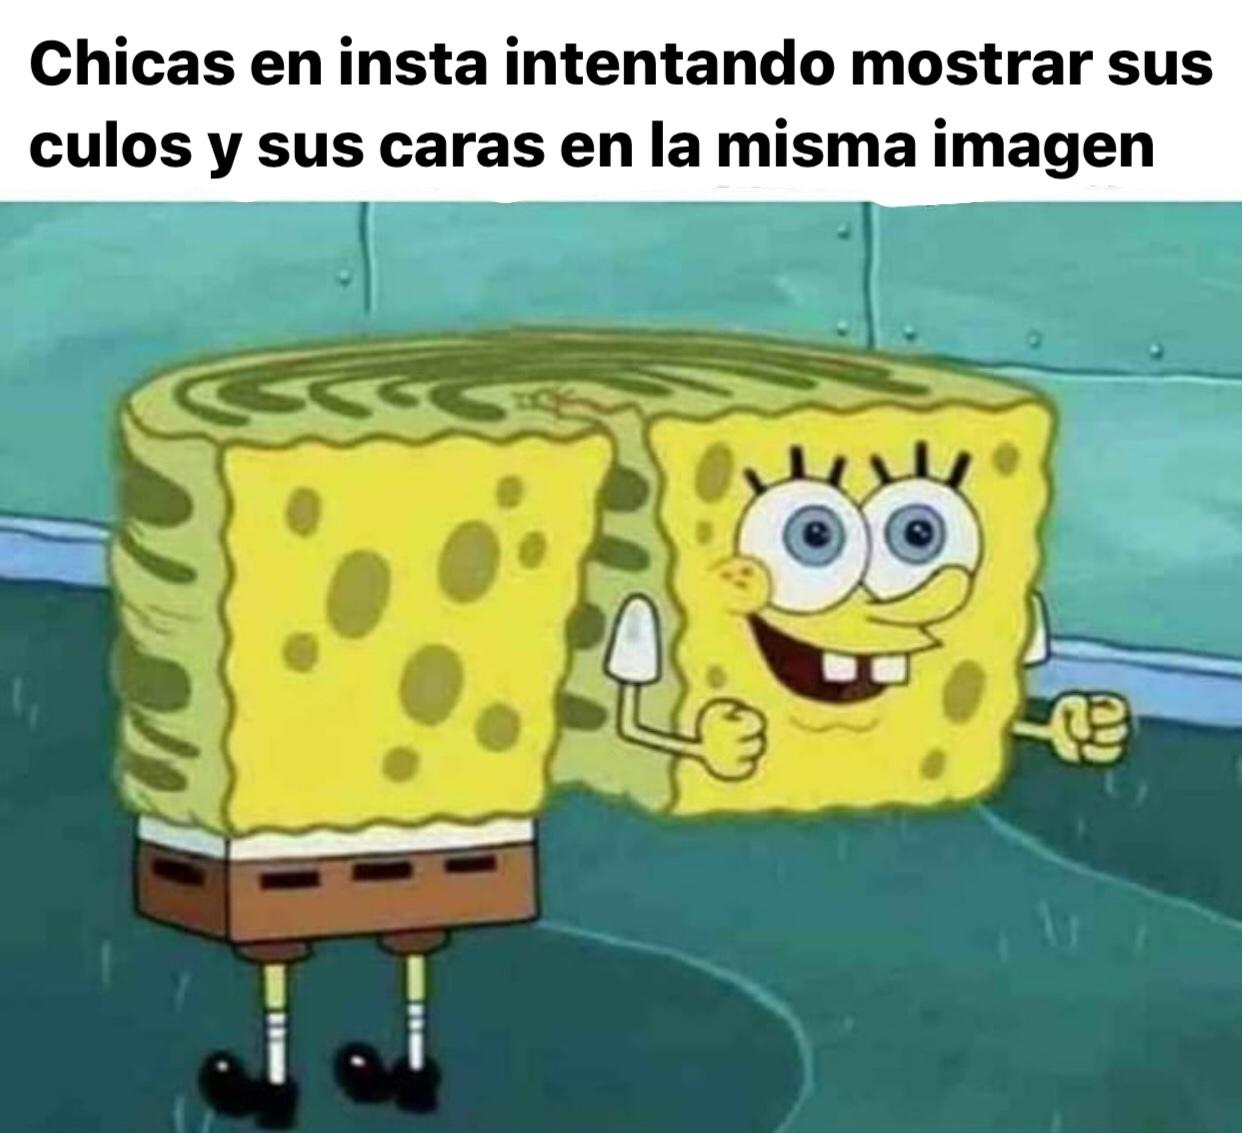 Smp - meme